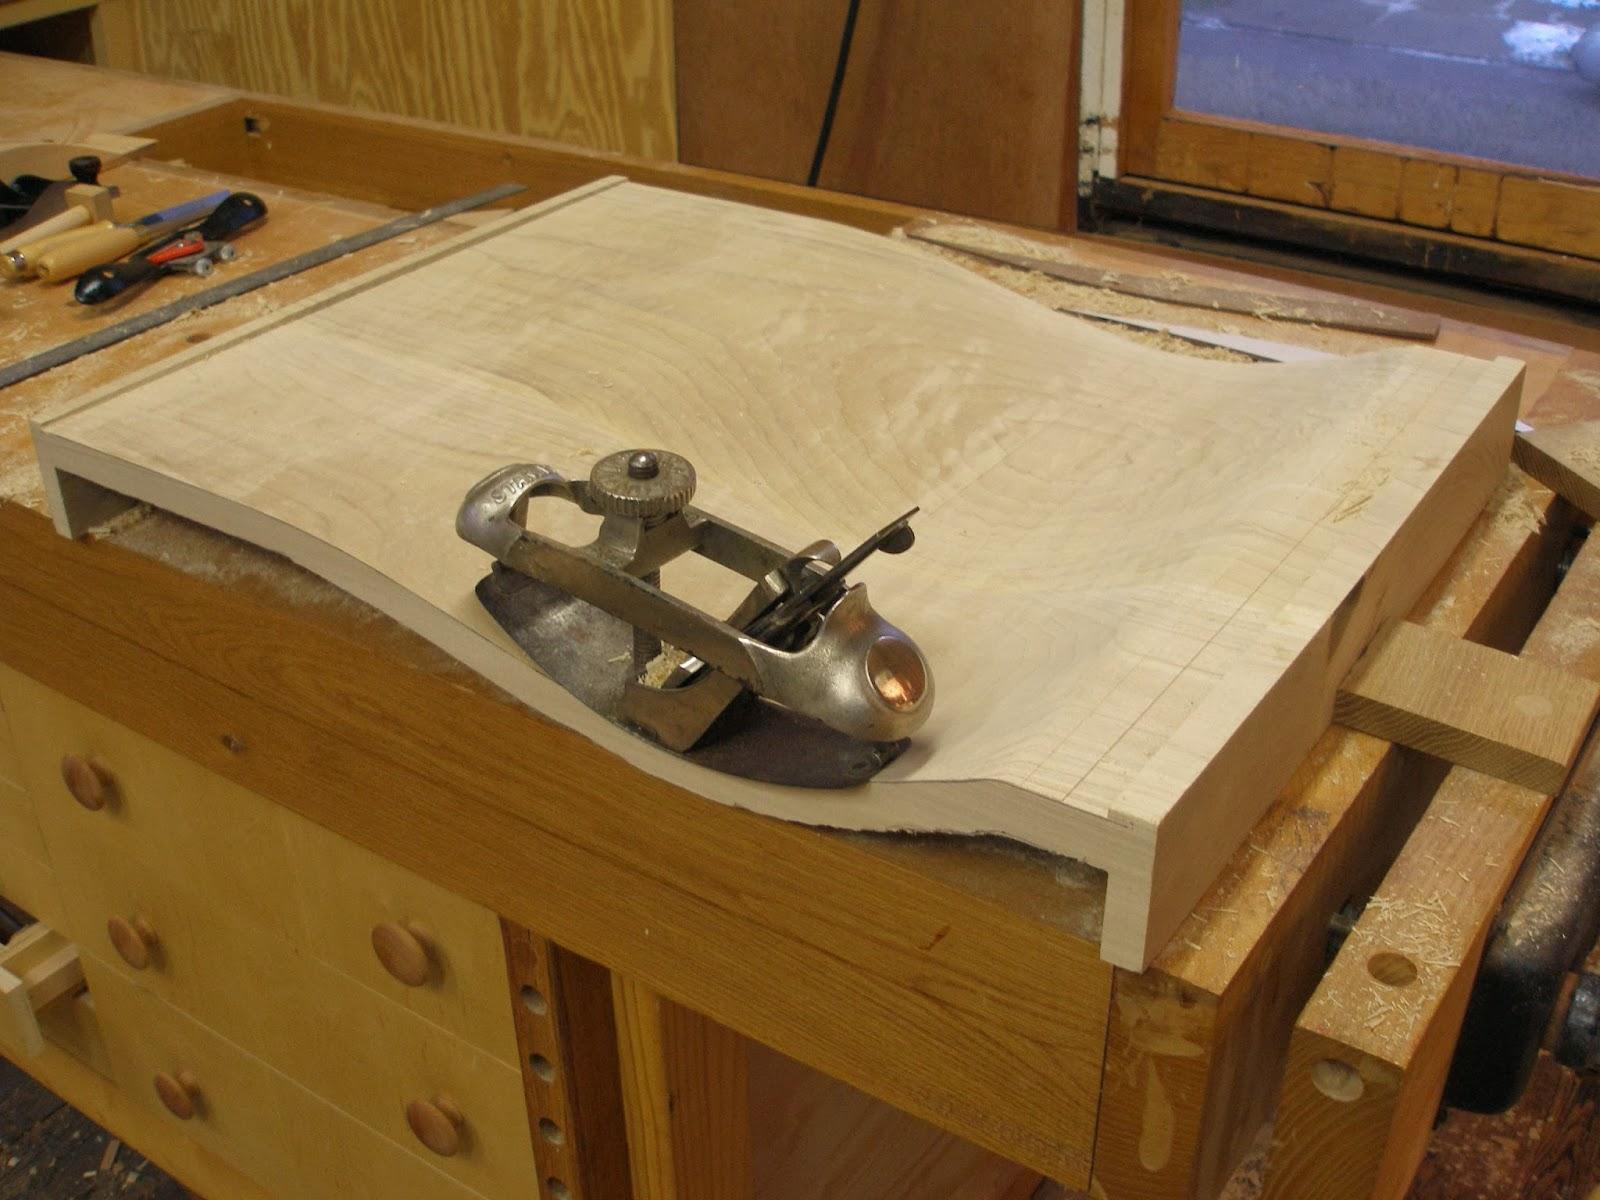 David Boeff Furniture Maker: Hooked on 18th Century Furniture